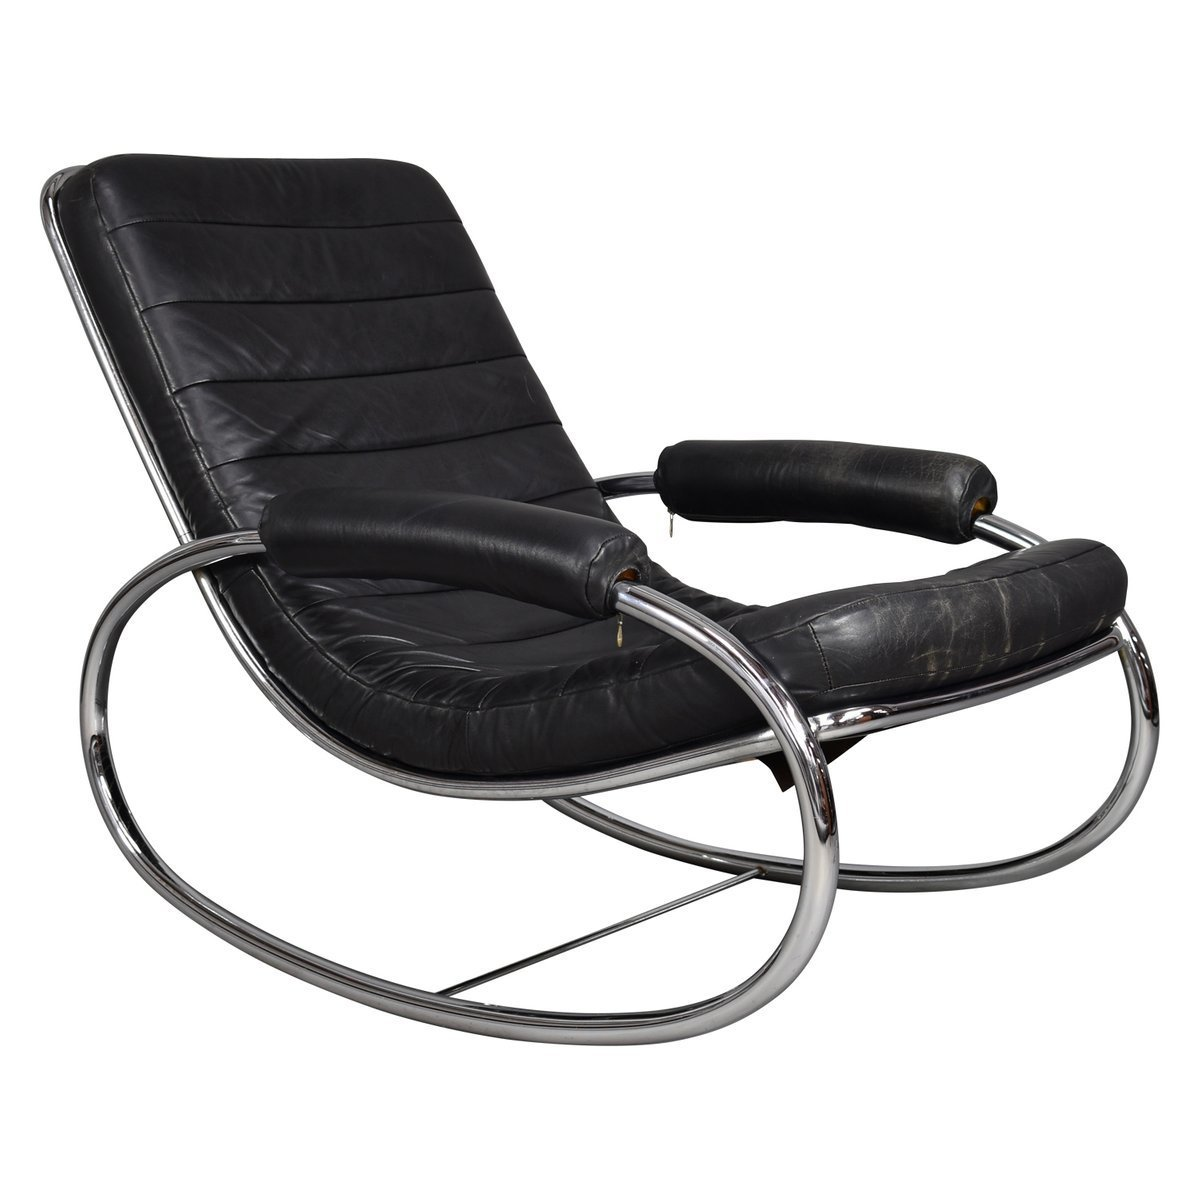 wholesale dealer 6d95e a0441 Vintage Chrome And Leather Rocking Chair, 1970s